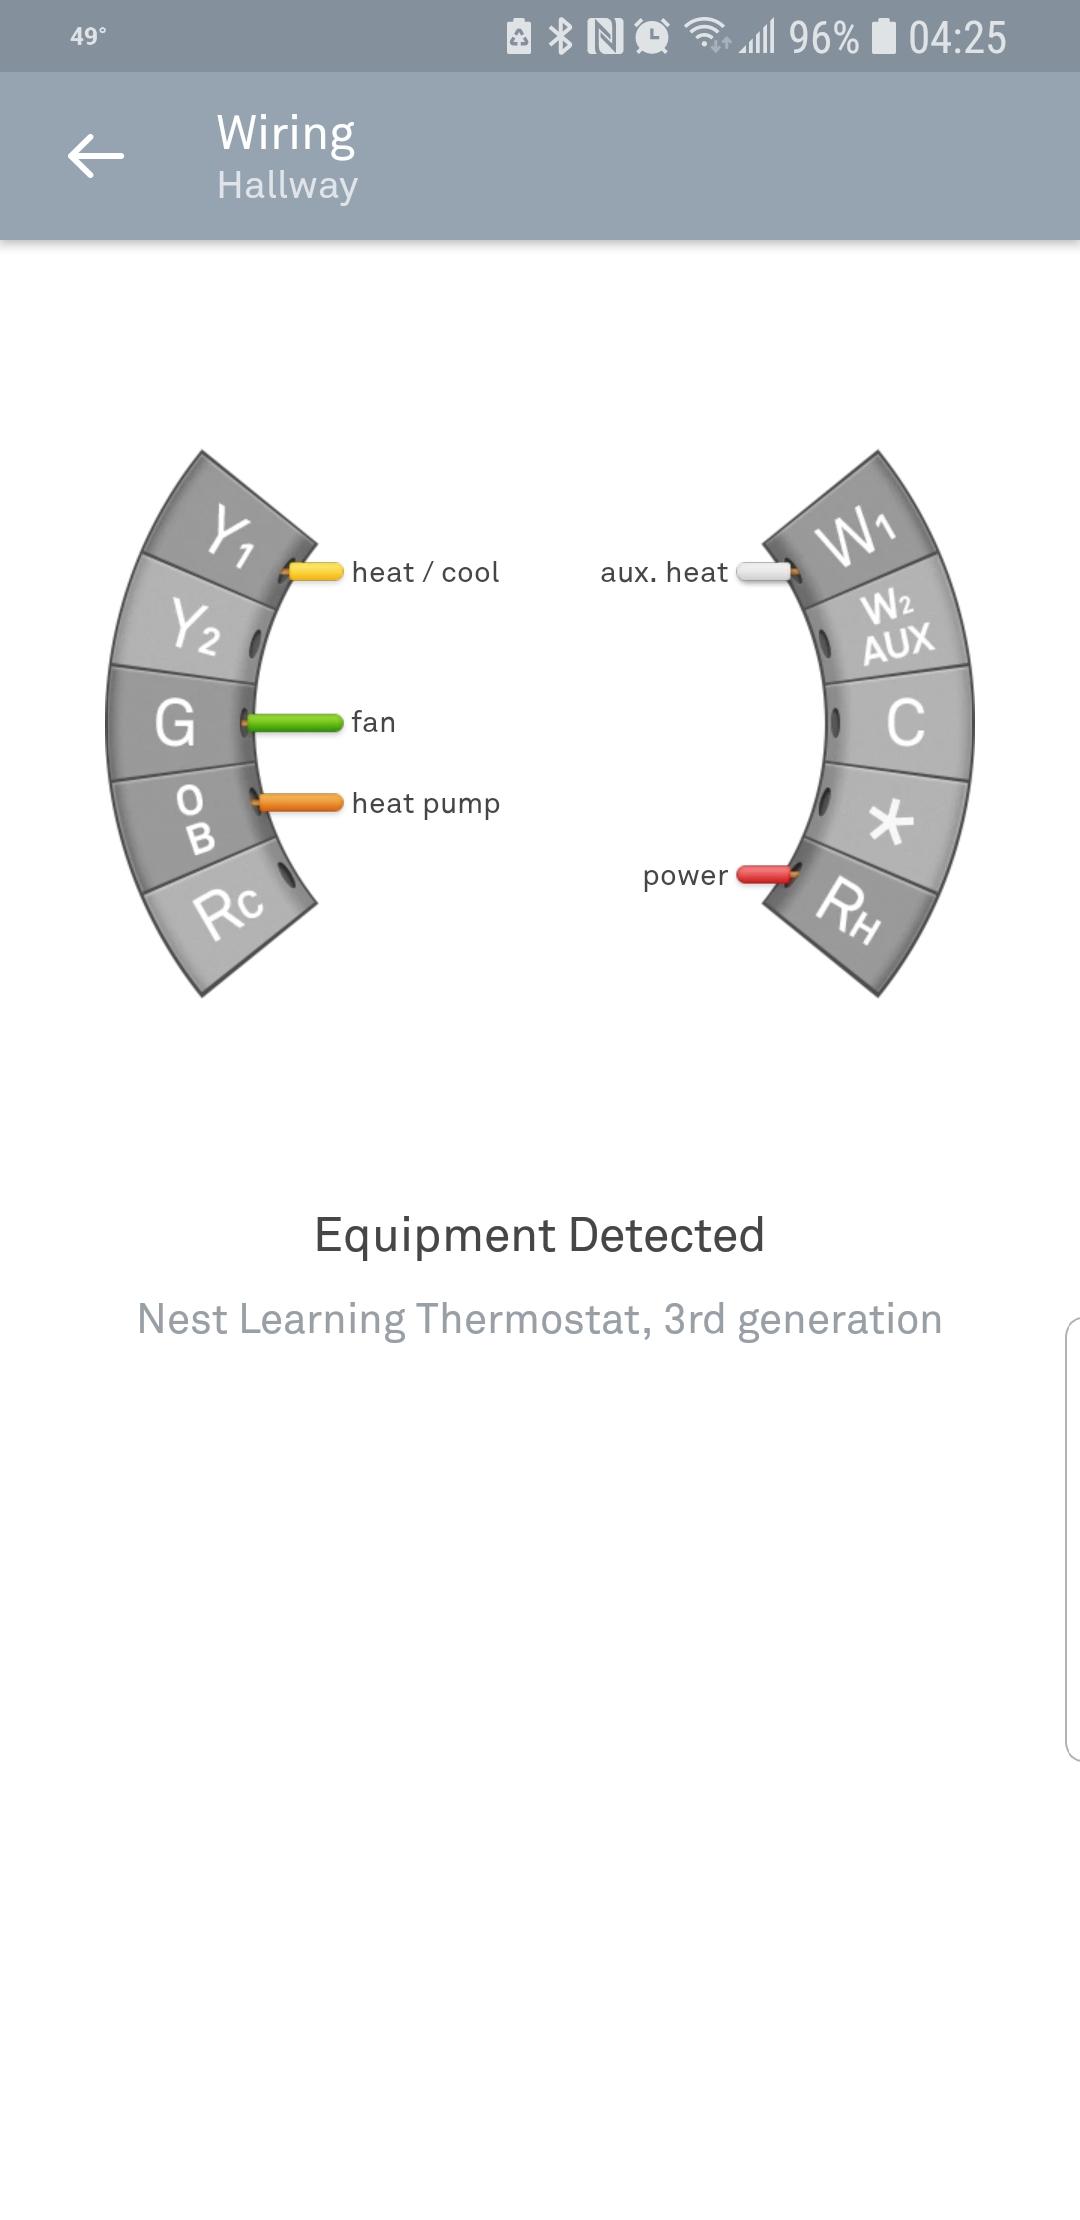 Auxiliary Heat Nest Wiring Diagram Heat Pump